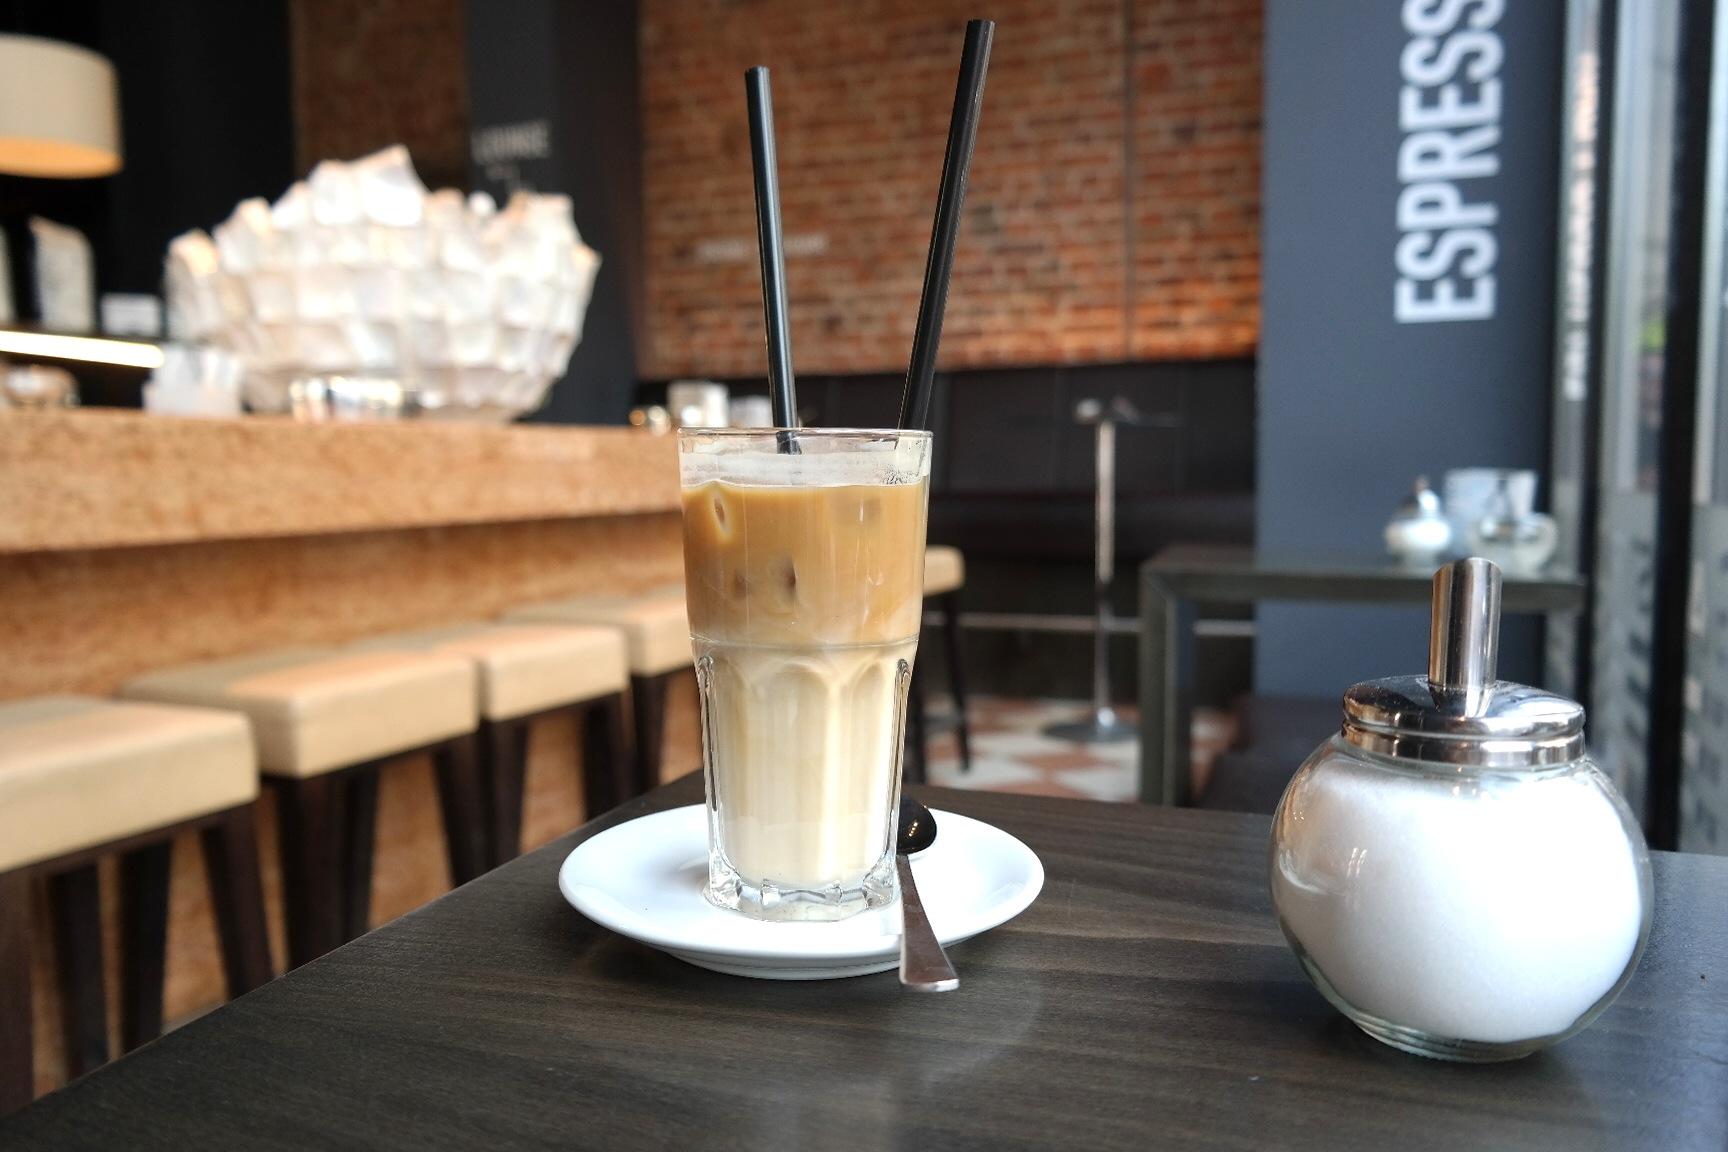 un caff per favore kaffee auf italienisch im galestro missbonn e bonn e. Black Bedroom Furniture Sets. Home Design Ideas